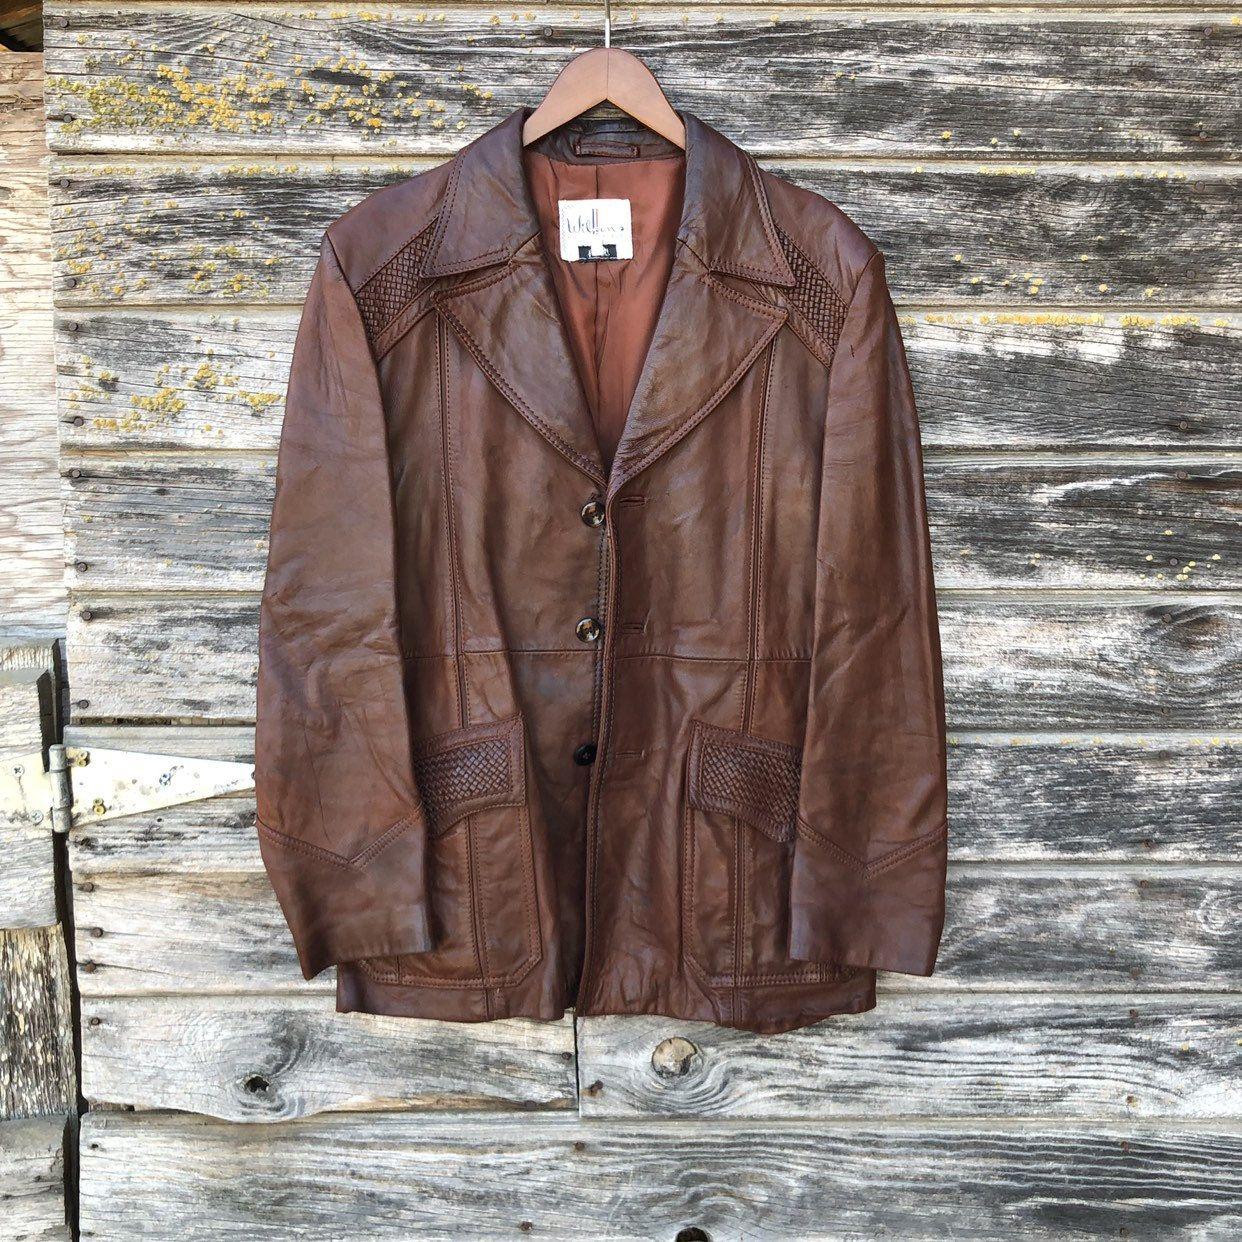 70s Brown Leather Jacket Men M Size 42 Vintage 1970s Retro Etsy Leather Jacket Men Brown Leather Jacket Men Leather Jacket [ 1242 x 1242 Pixel ]